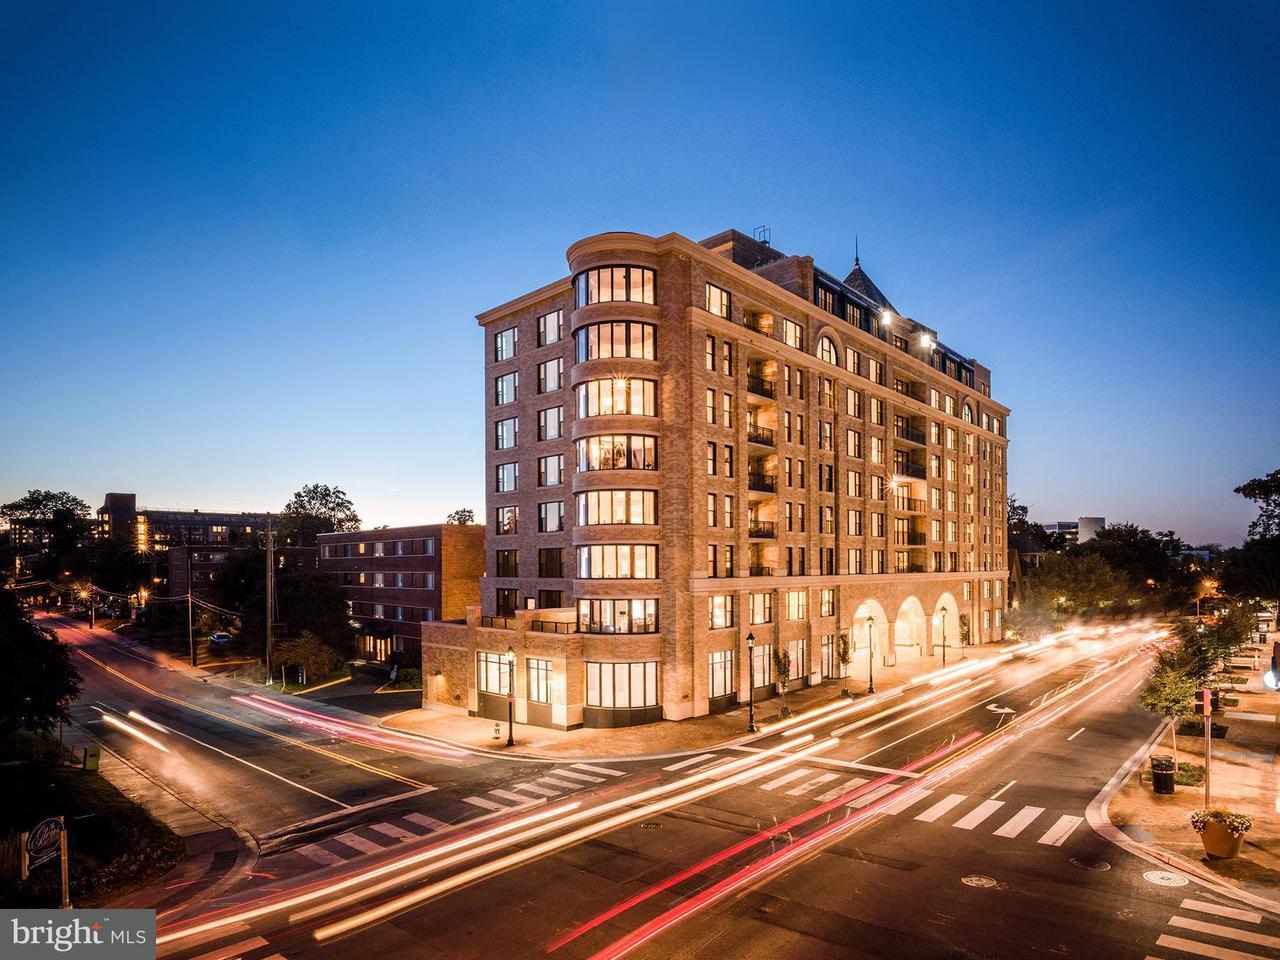 Condominium for Sale at 8302 Woodmont Ave #404 8302 Woodmont Ave #404 Bethesda, Maryland 20814 United States